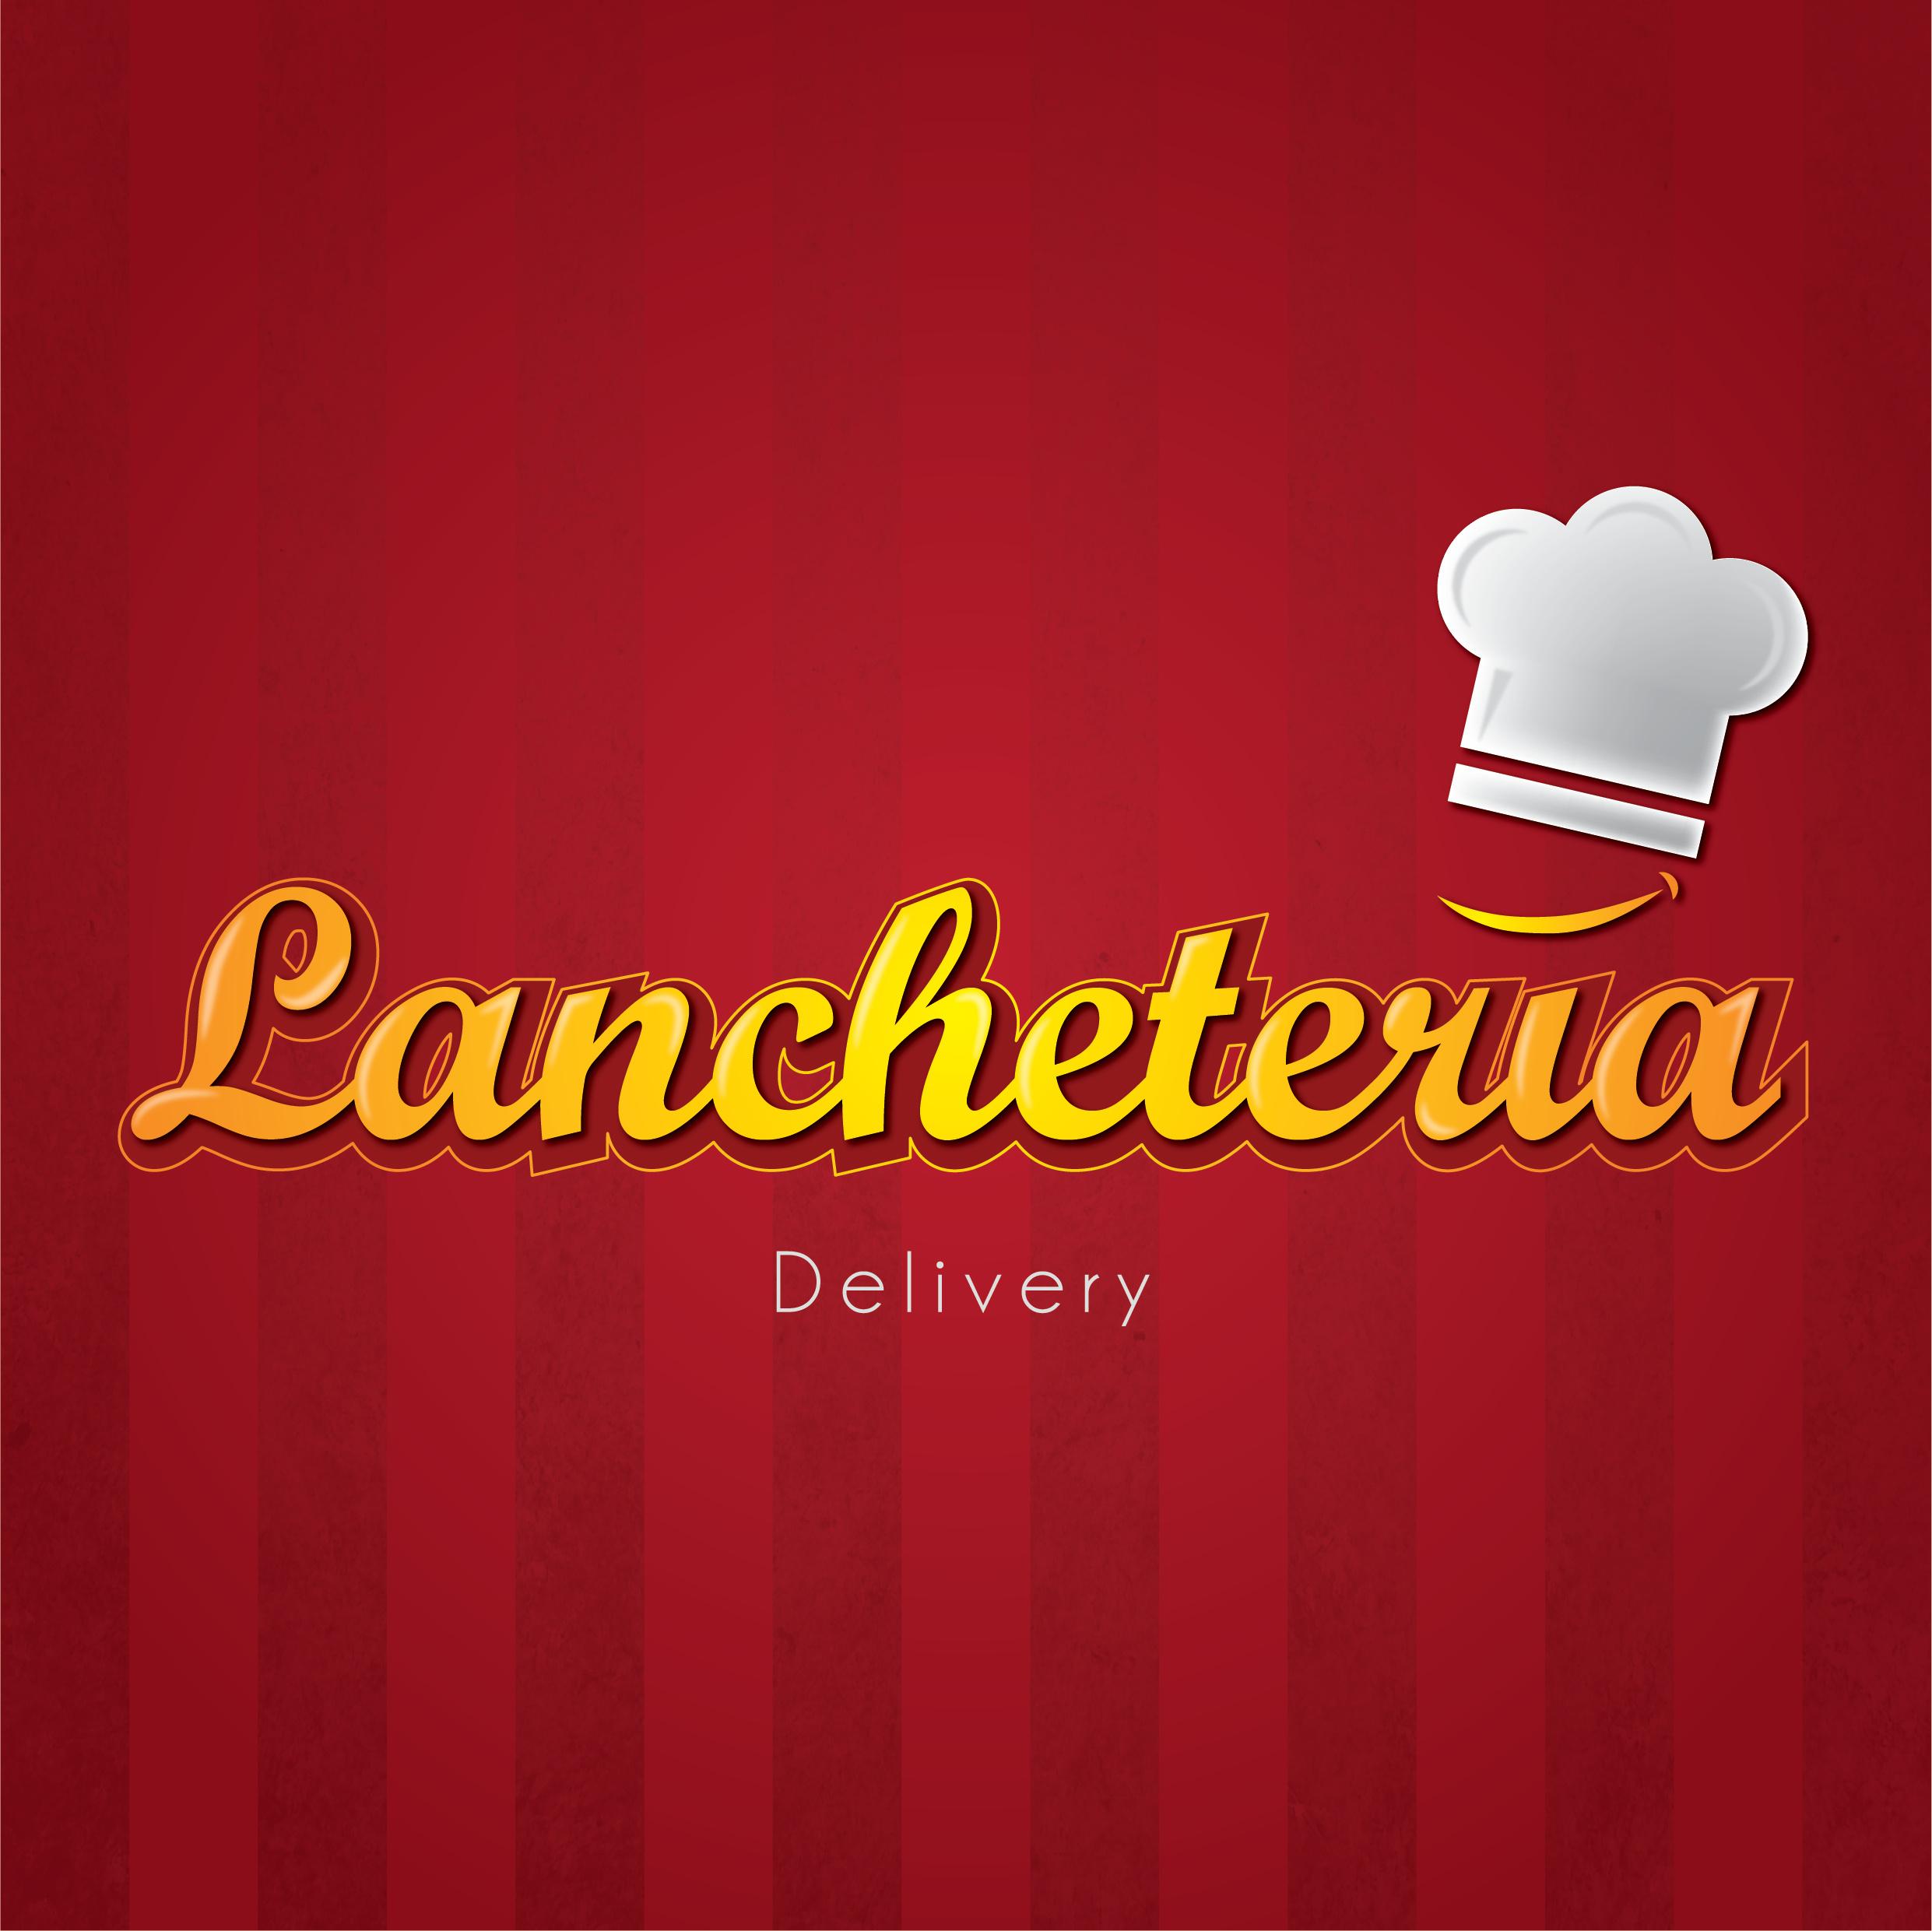 Lancheteria Delivery